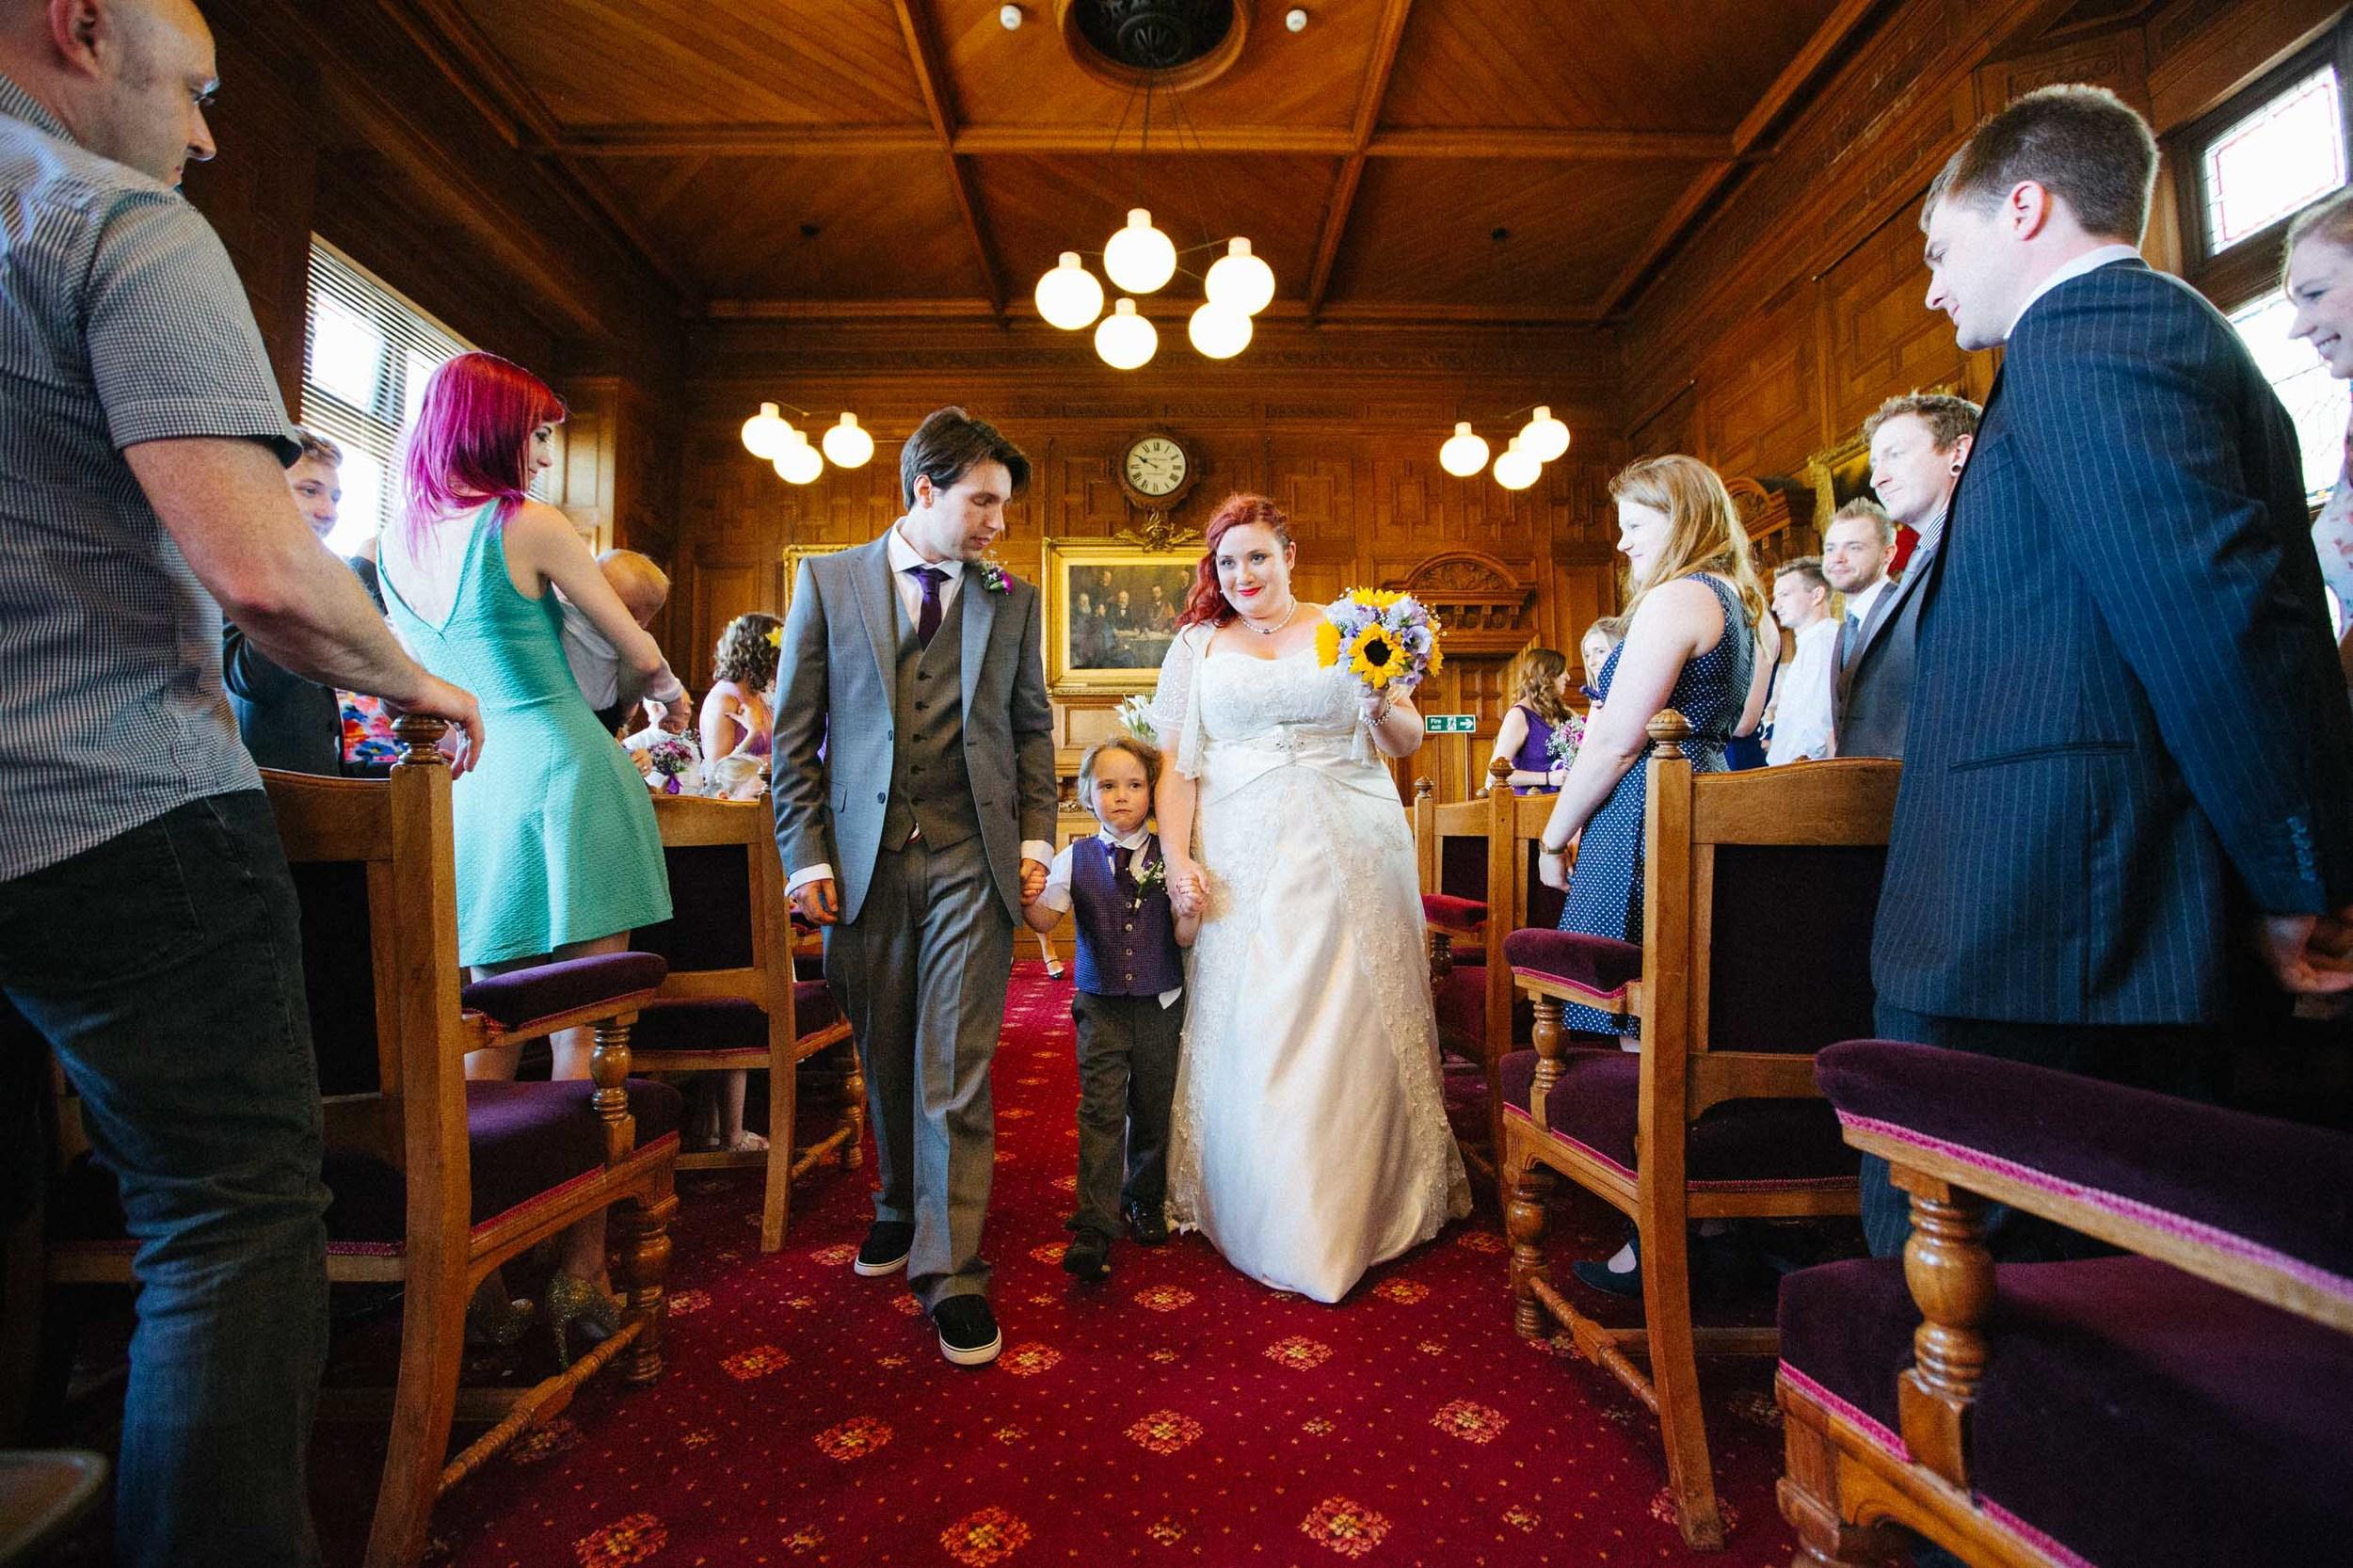 eastbourne-town-hall-london-uk-destination-wedding-photography-Adam-Rowley